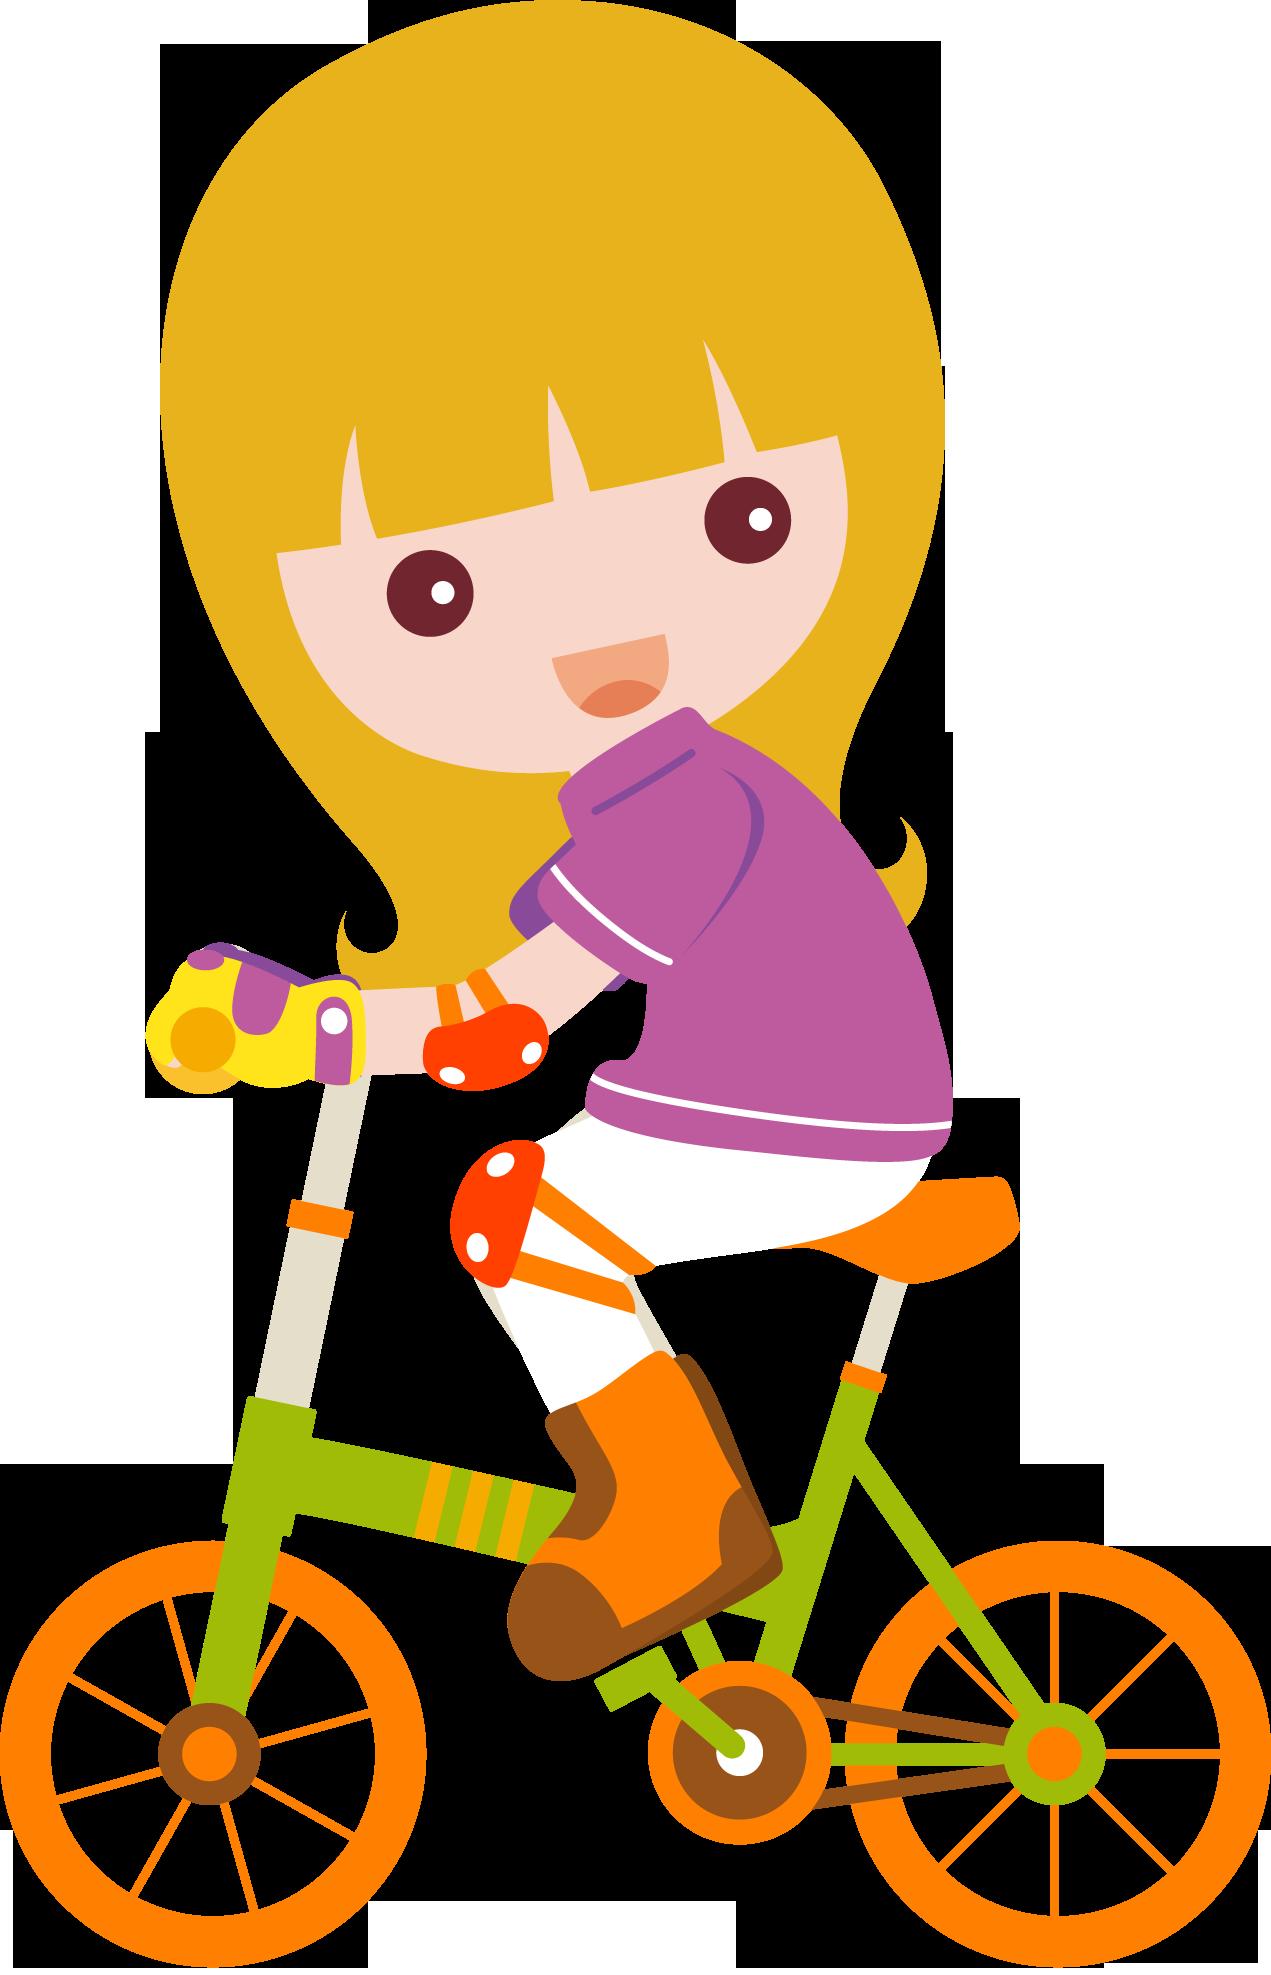 Bicicleta Imagenes Infantiles Bicicletas Ninos Ninos